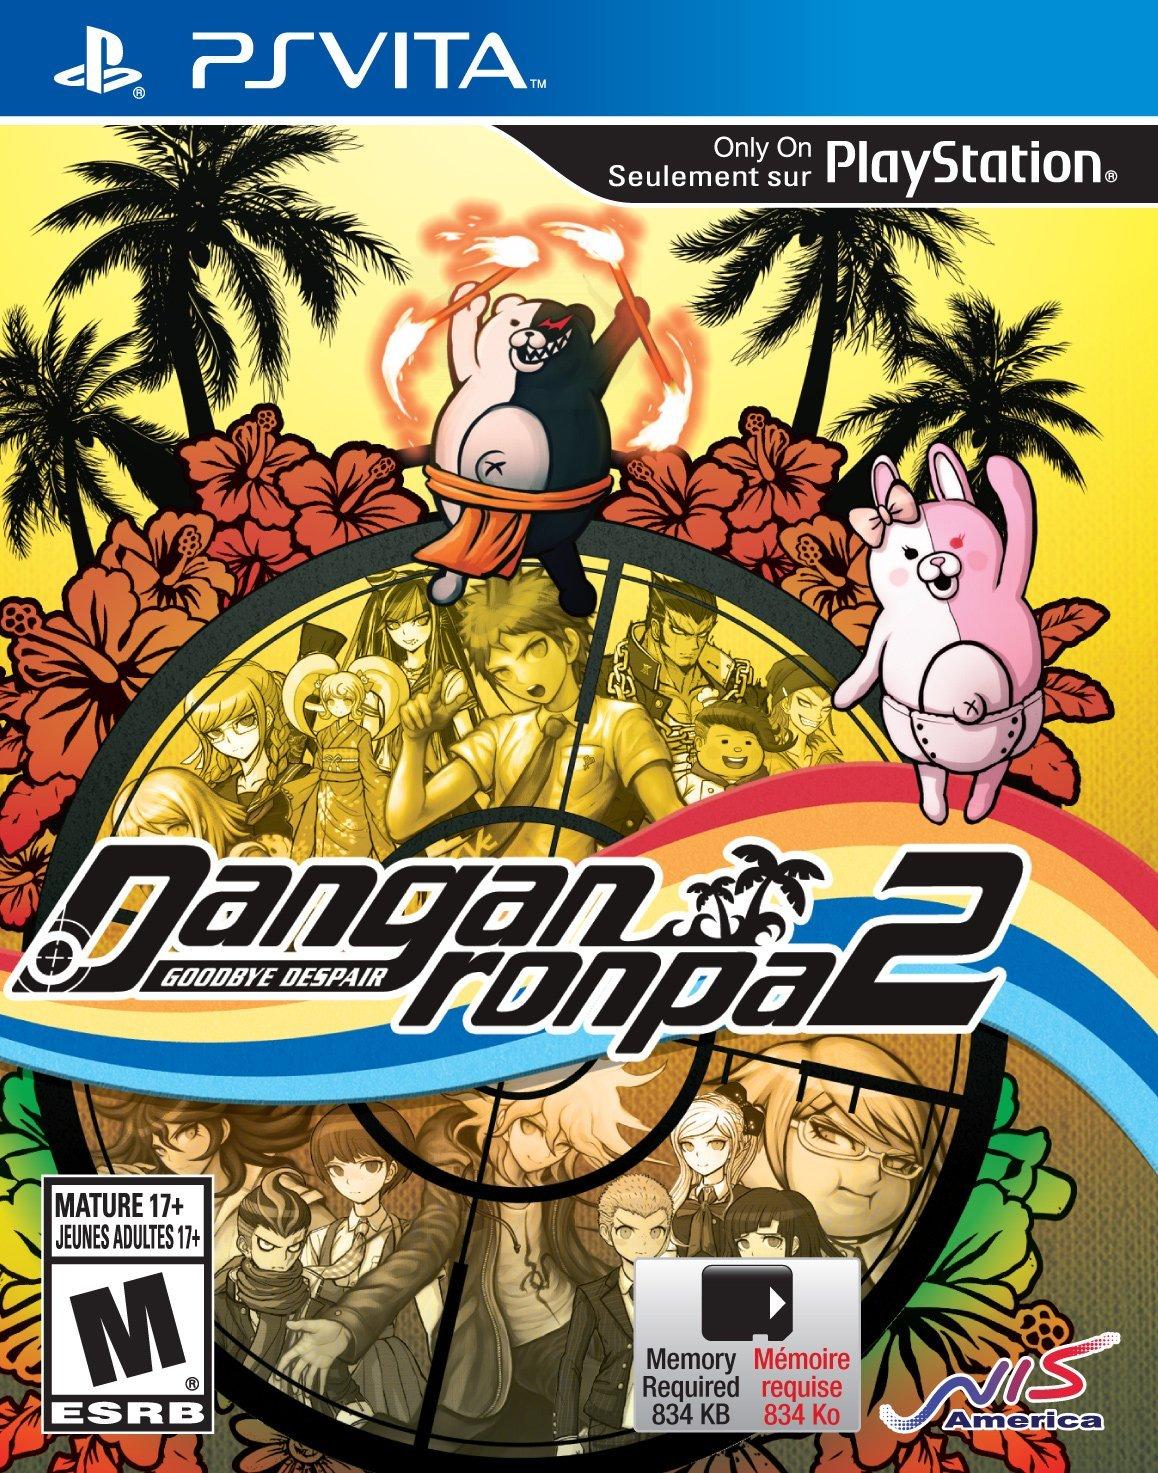 Danganronpa 2 Pics, Anime Collection